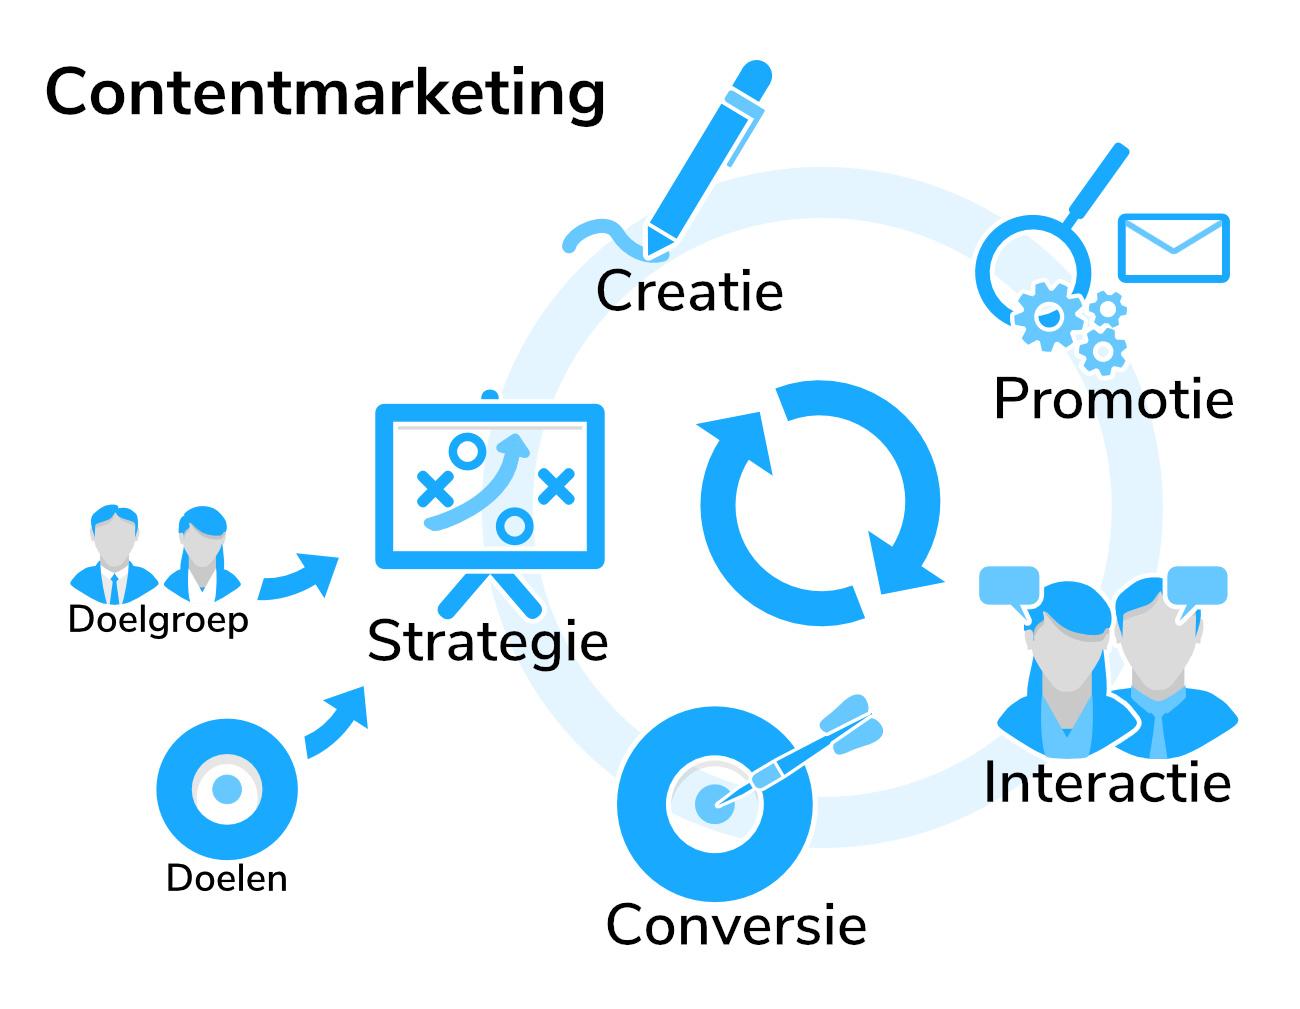 linku contentmarketingmodel